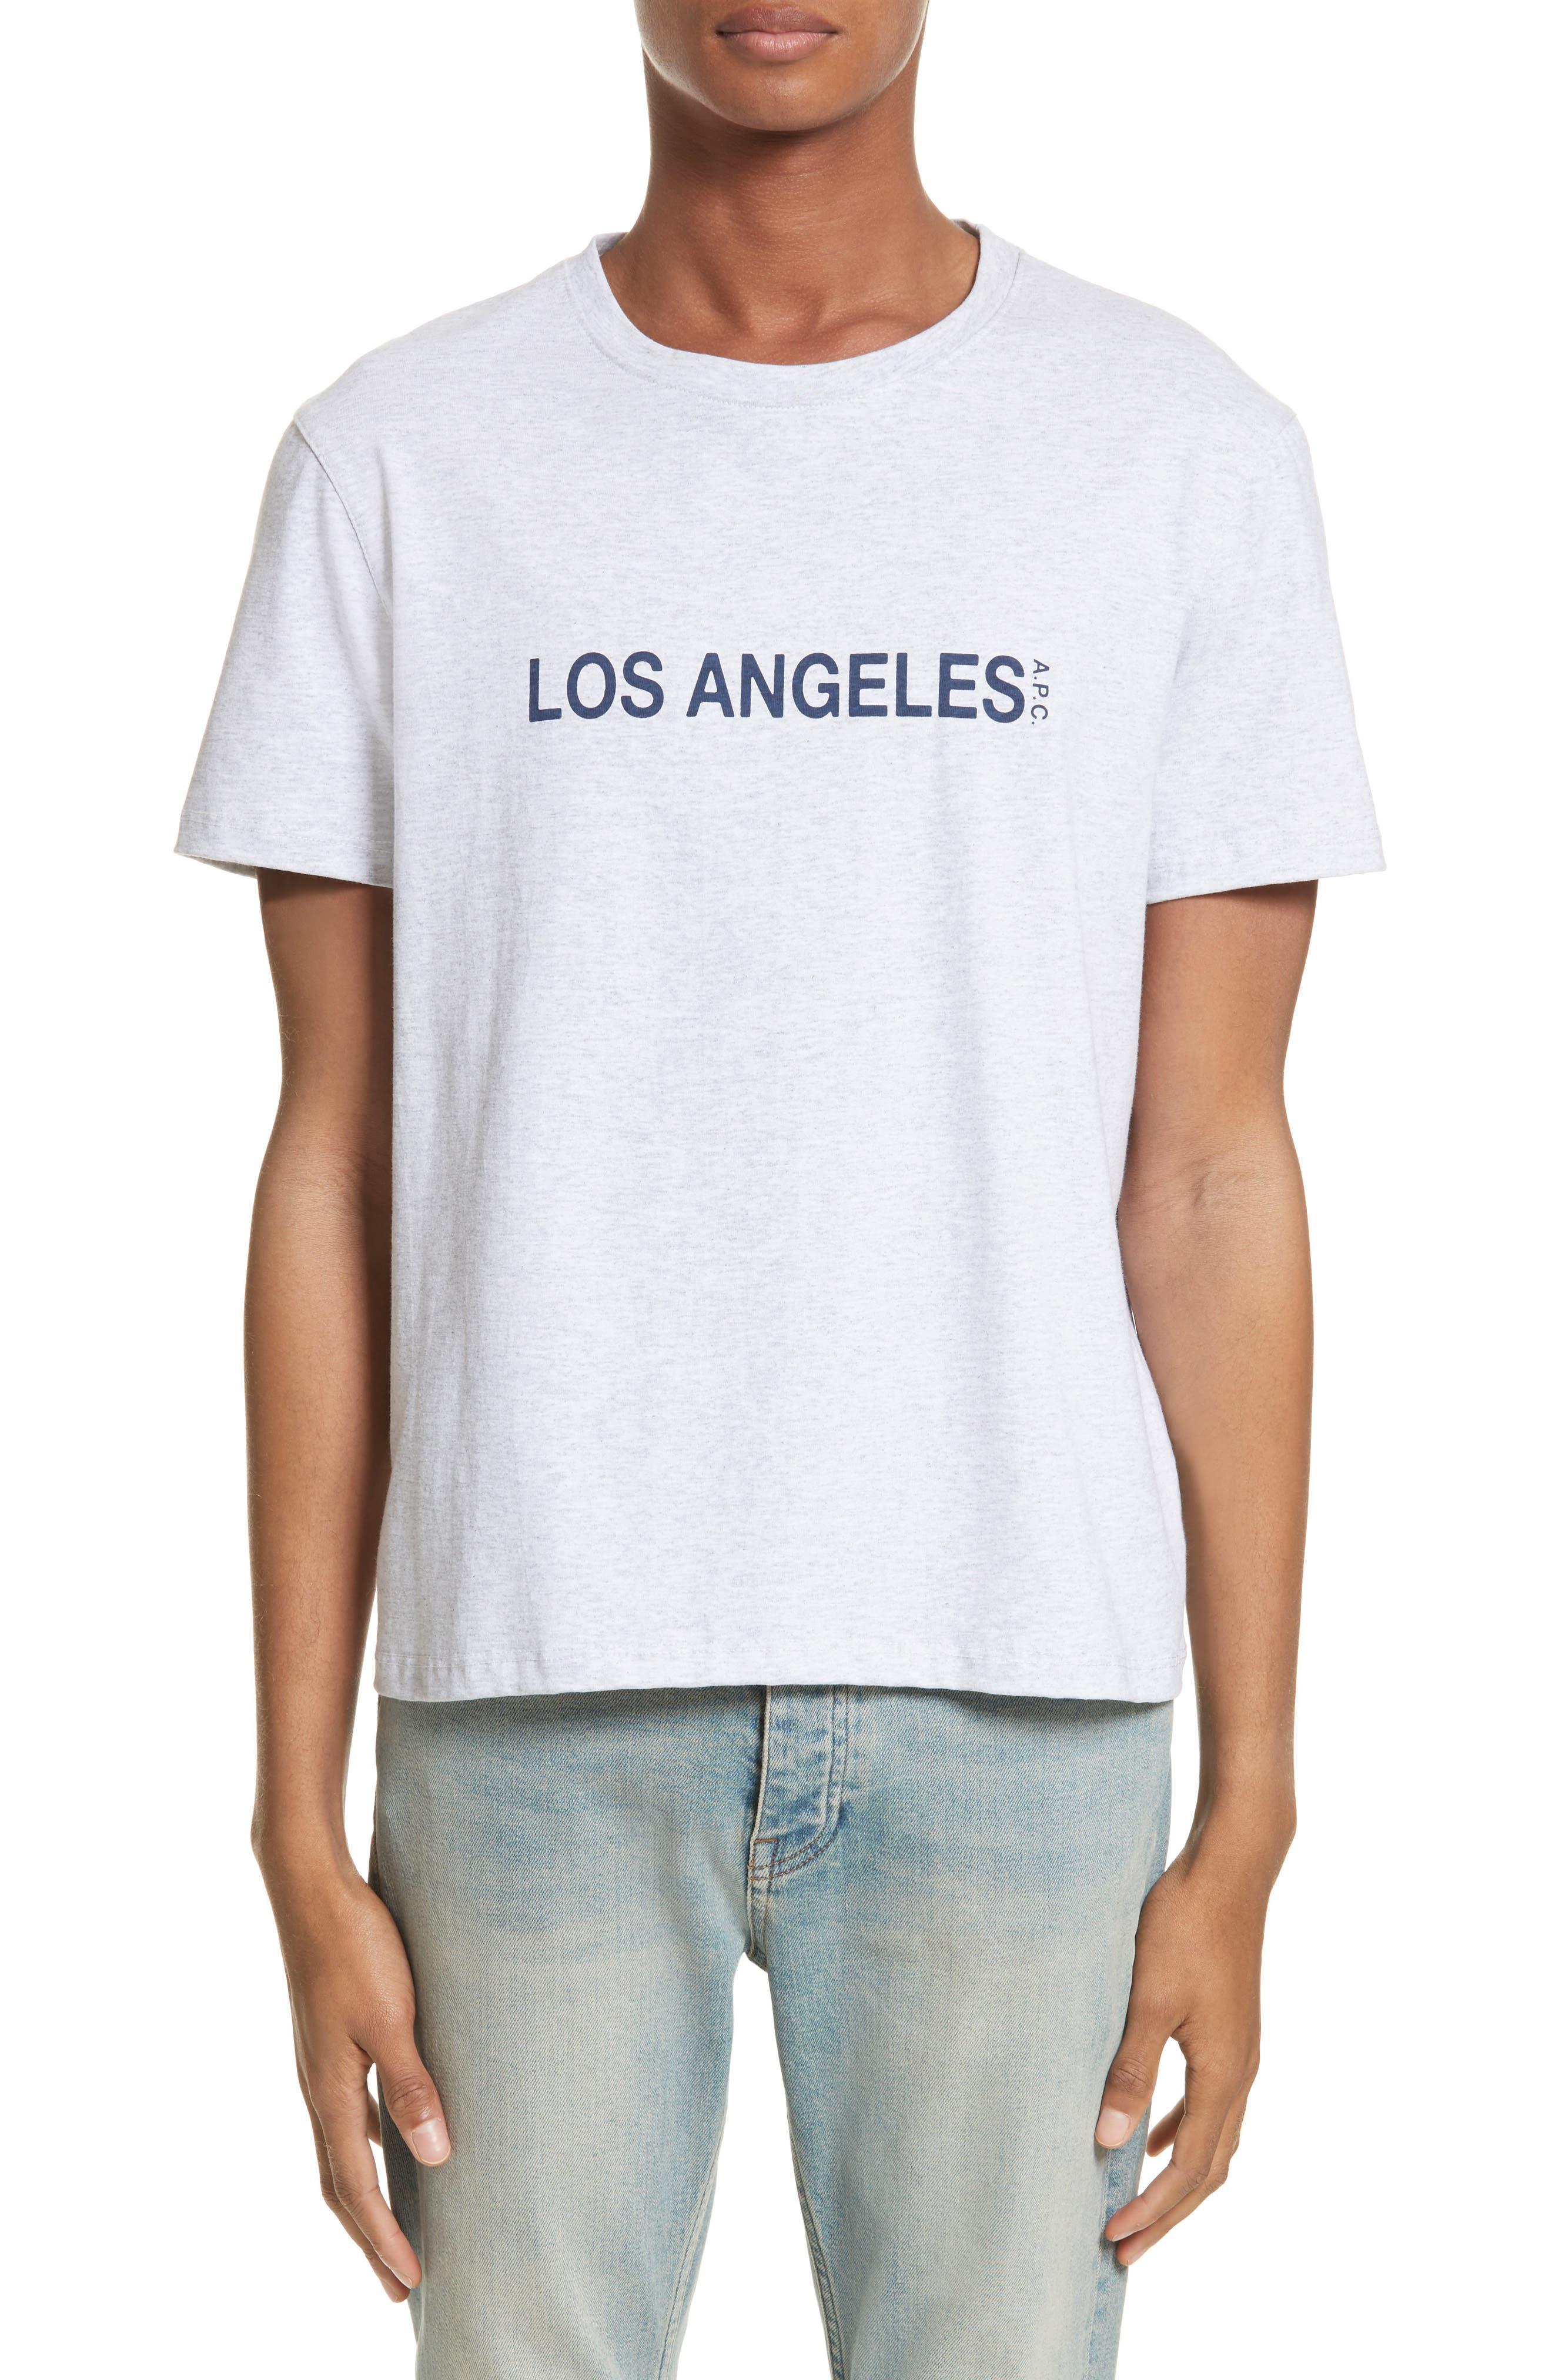 Los Angeles Graphic T-Shirt,                         Main,                         color, 063